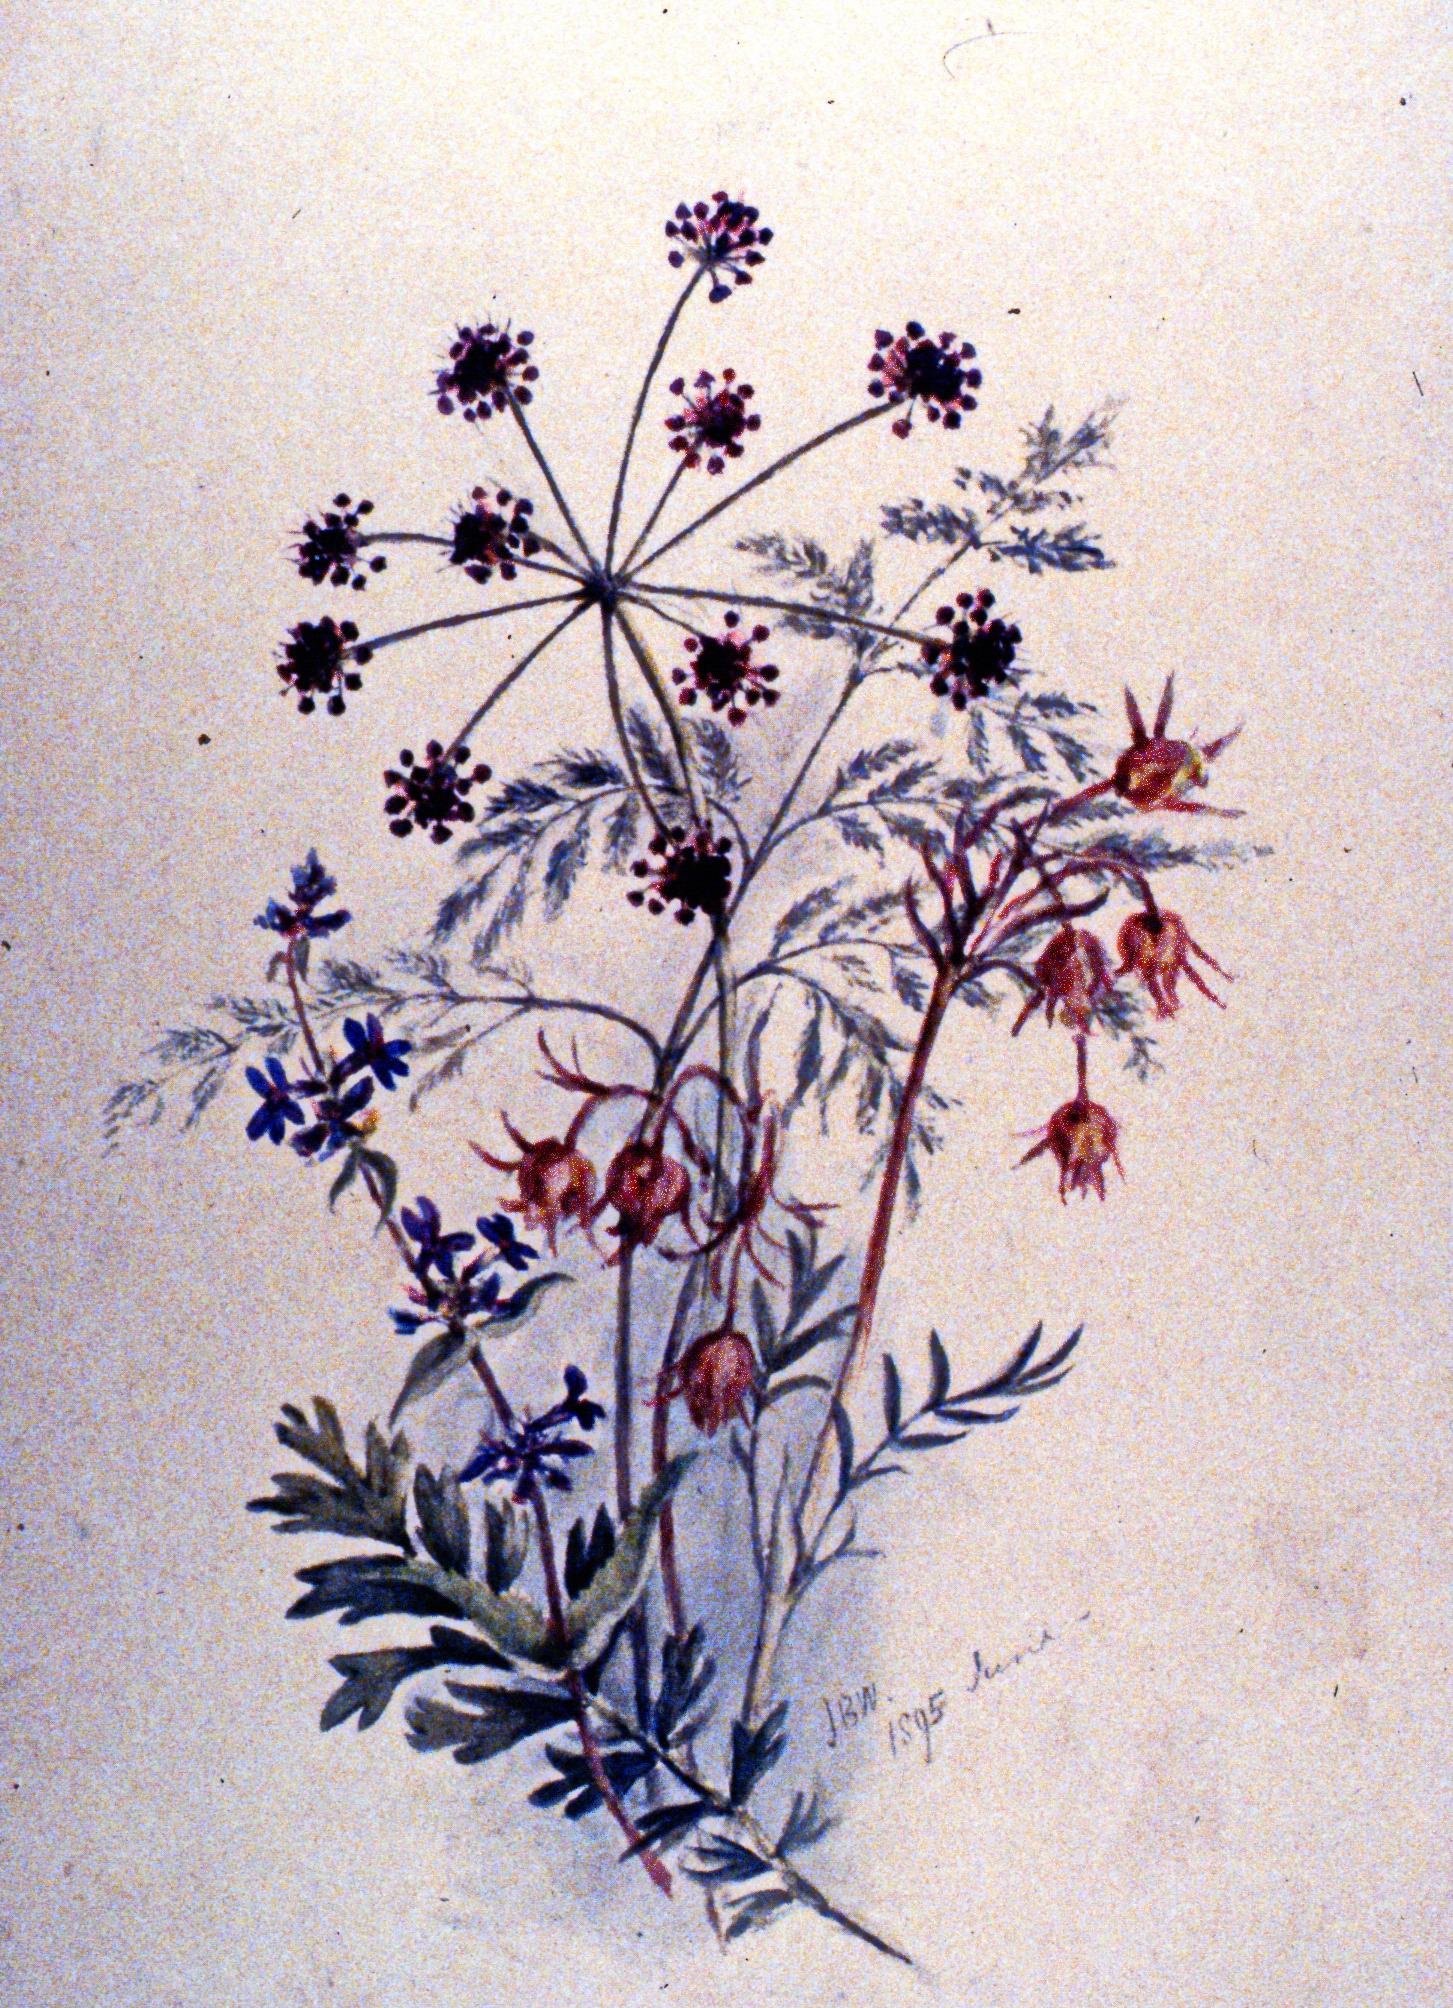 Untitled (Leptontaenia, Multifia), 1895, Julia Bullock Webster, watercolour on paper, 35.5 x 25.2 cm,1983.02.23. Gift of Mrs. Barbara Steel.